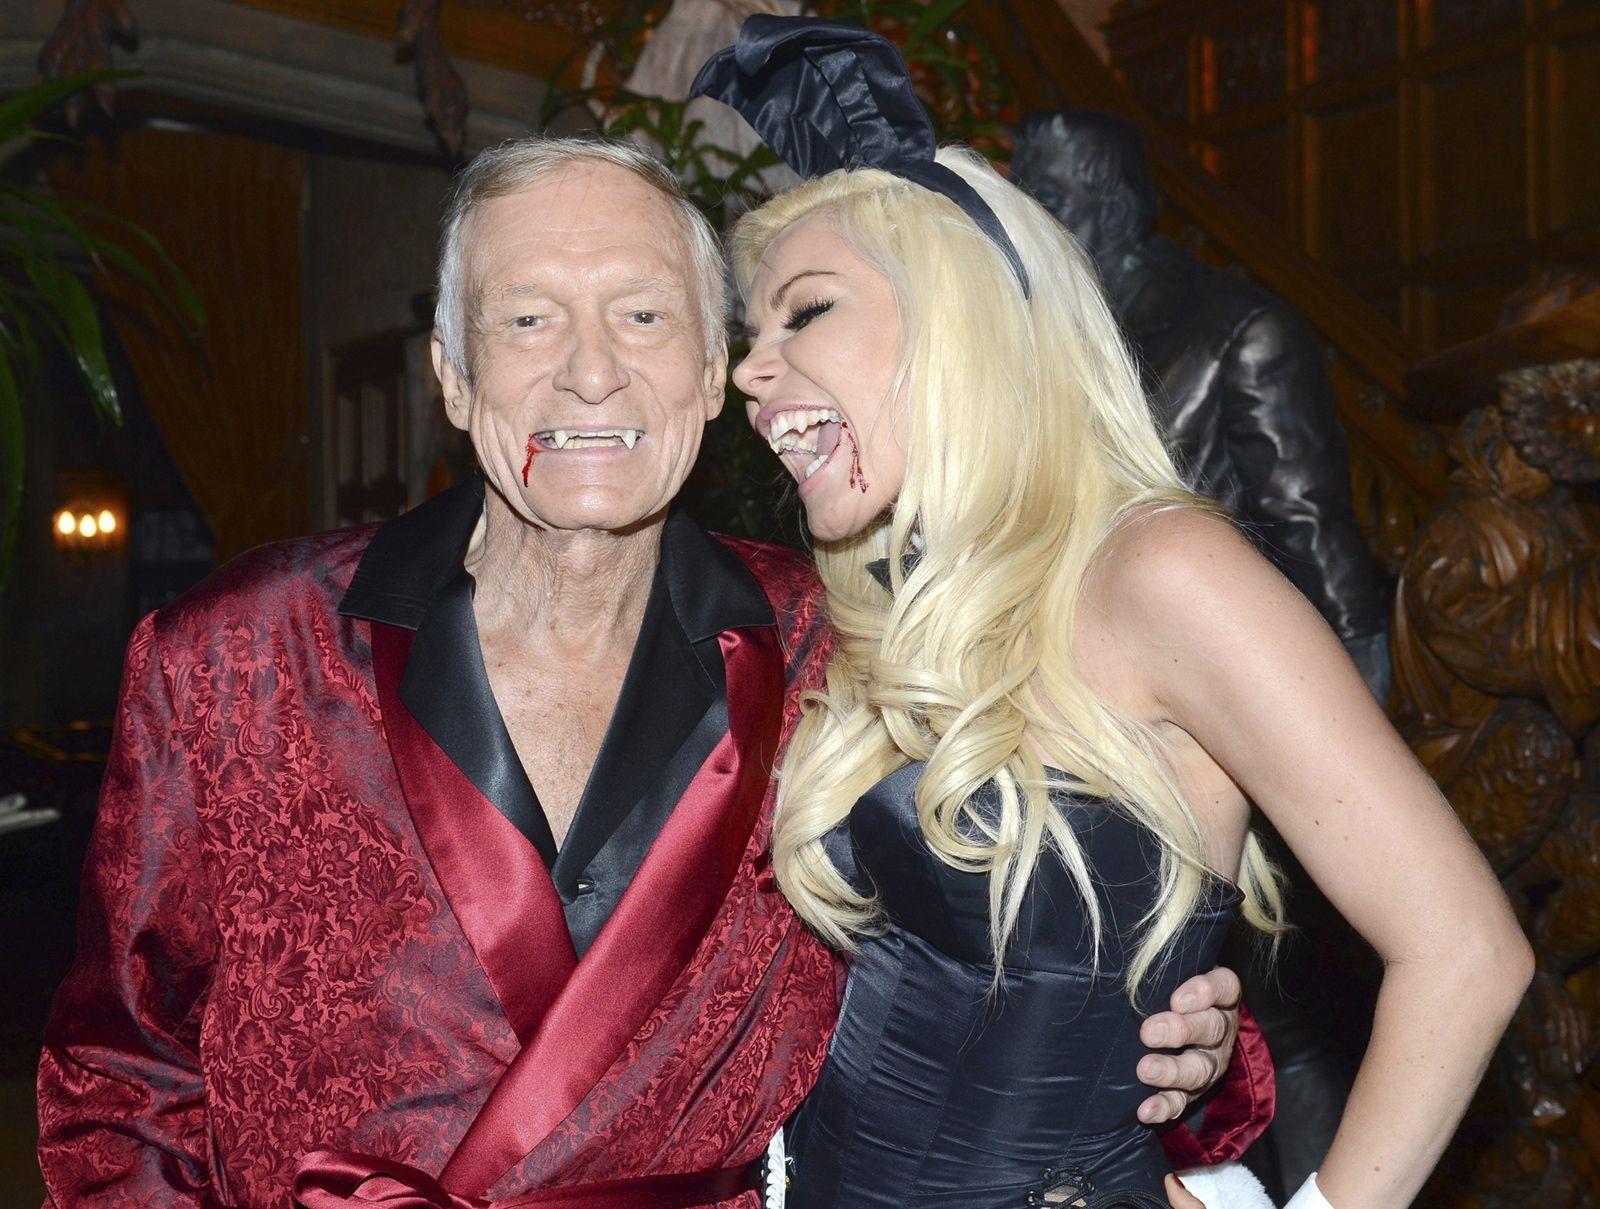 Celeb Pix: Inside Hugh Hefner's Halloween party at Playboy Mansion ...